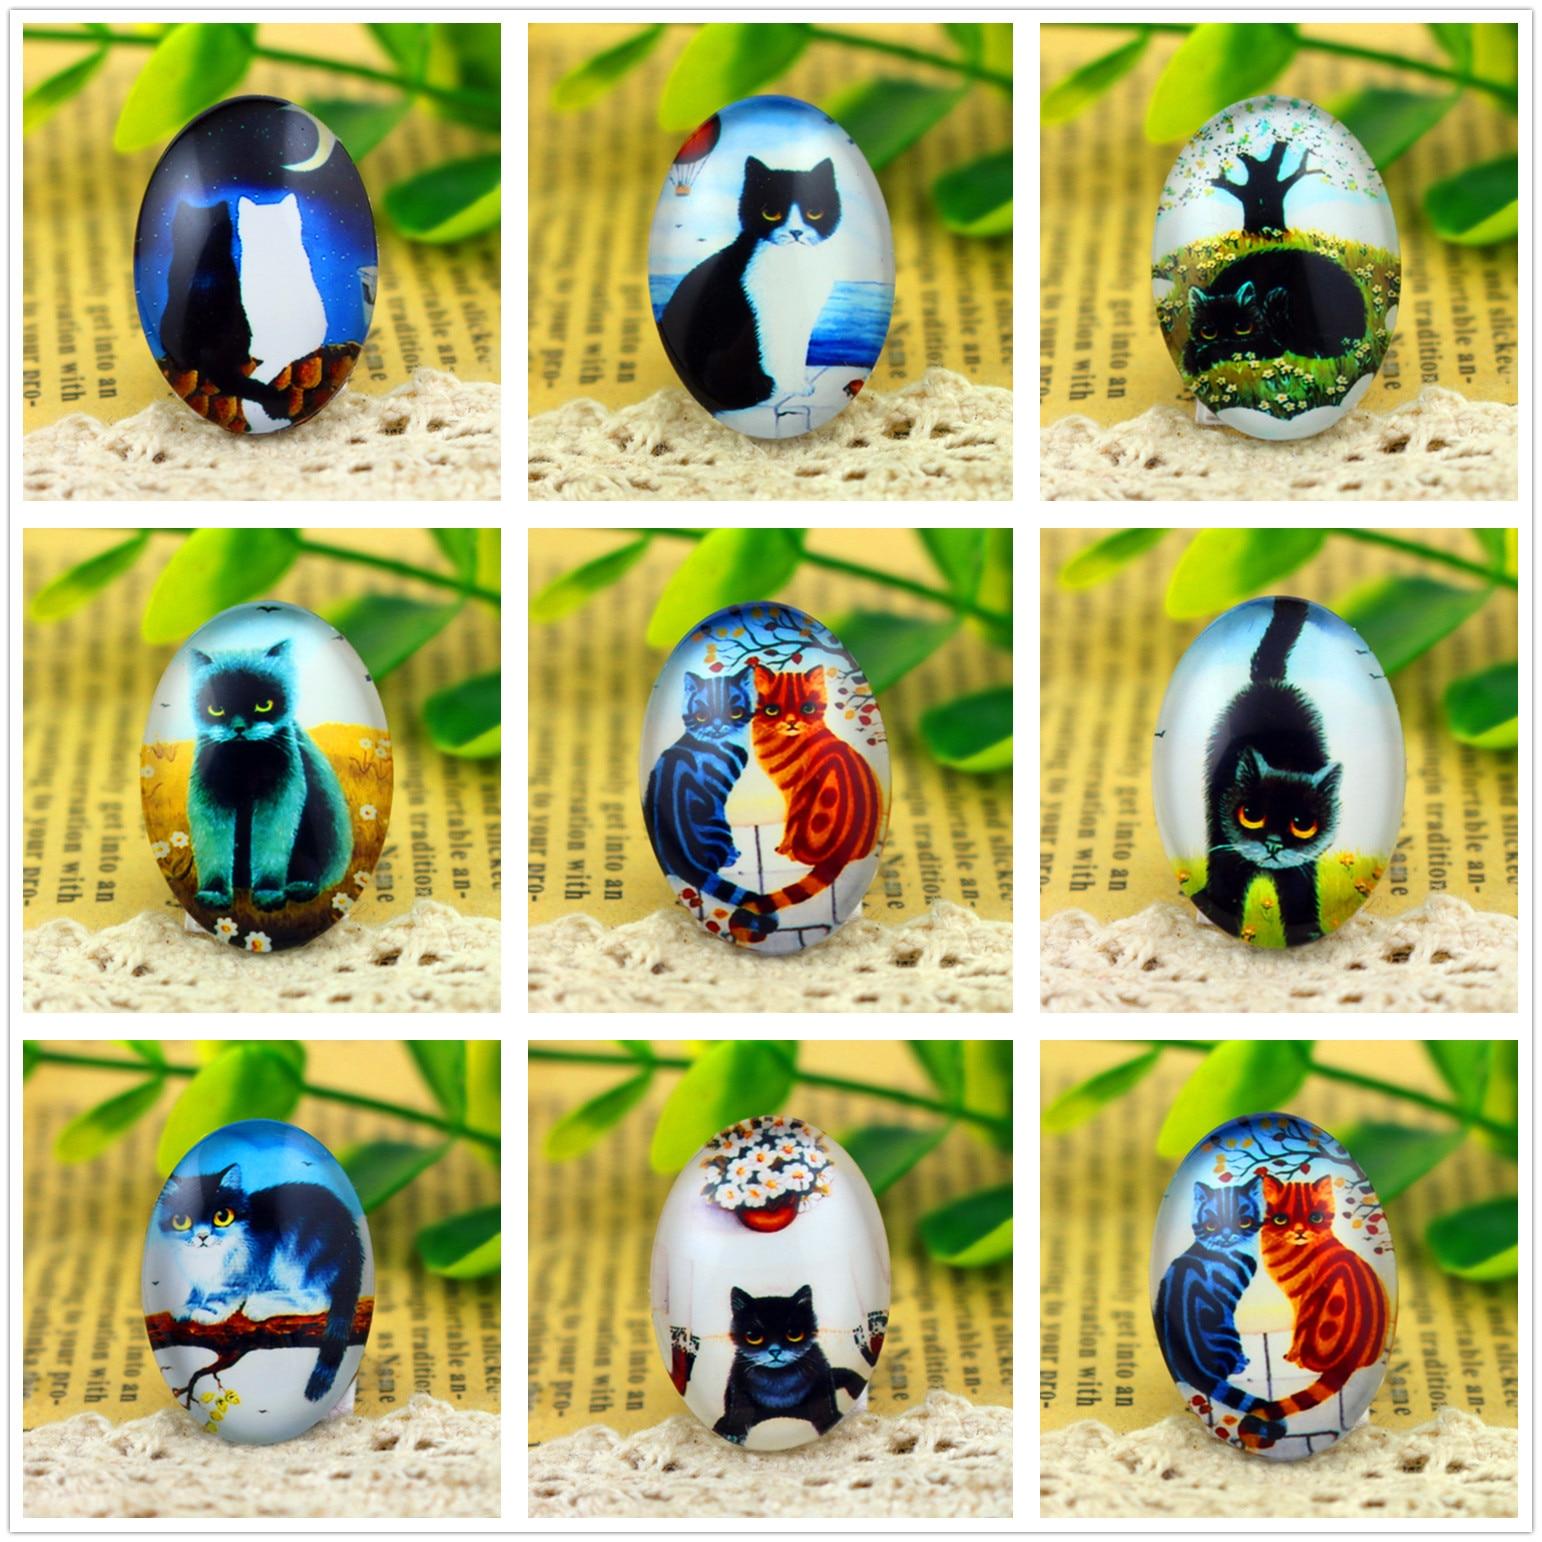 Hot Sale 10pcs 18x25mm Handmade Photo Glass Cabochons  (Cold Cat Series)